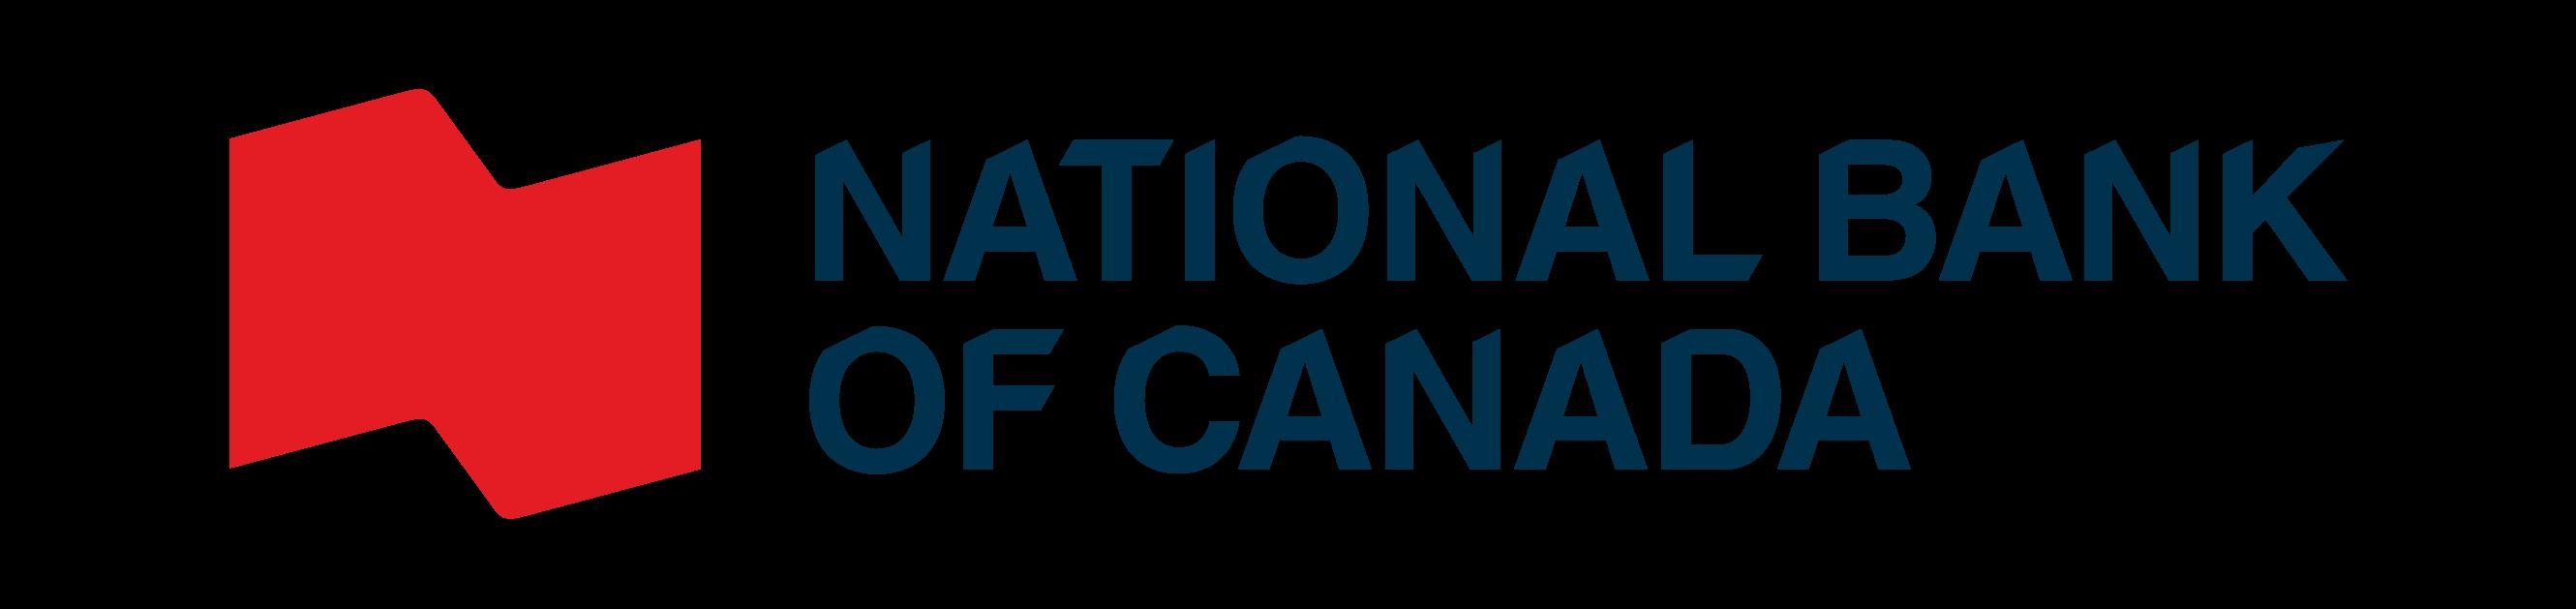 Logo der National Bank of Canada